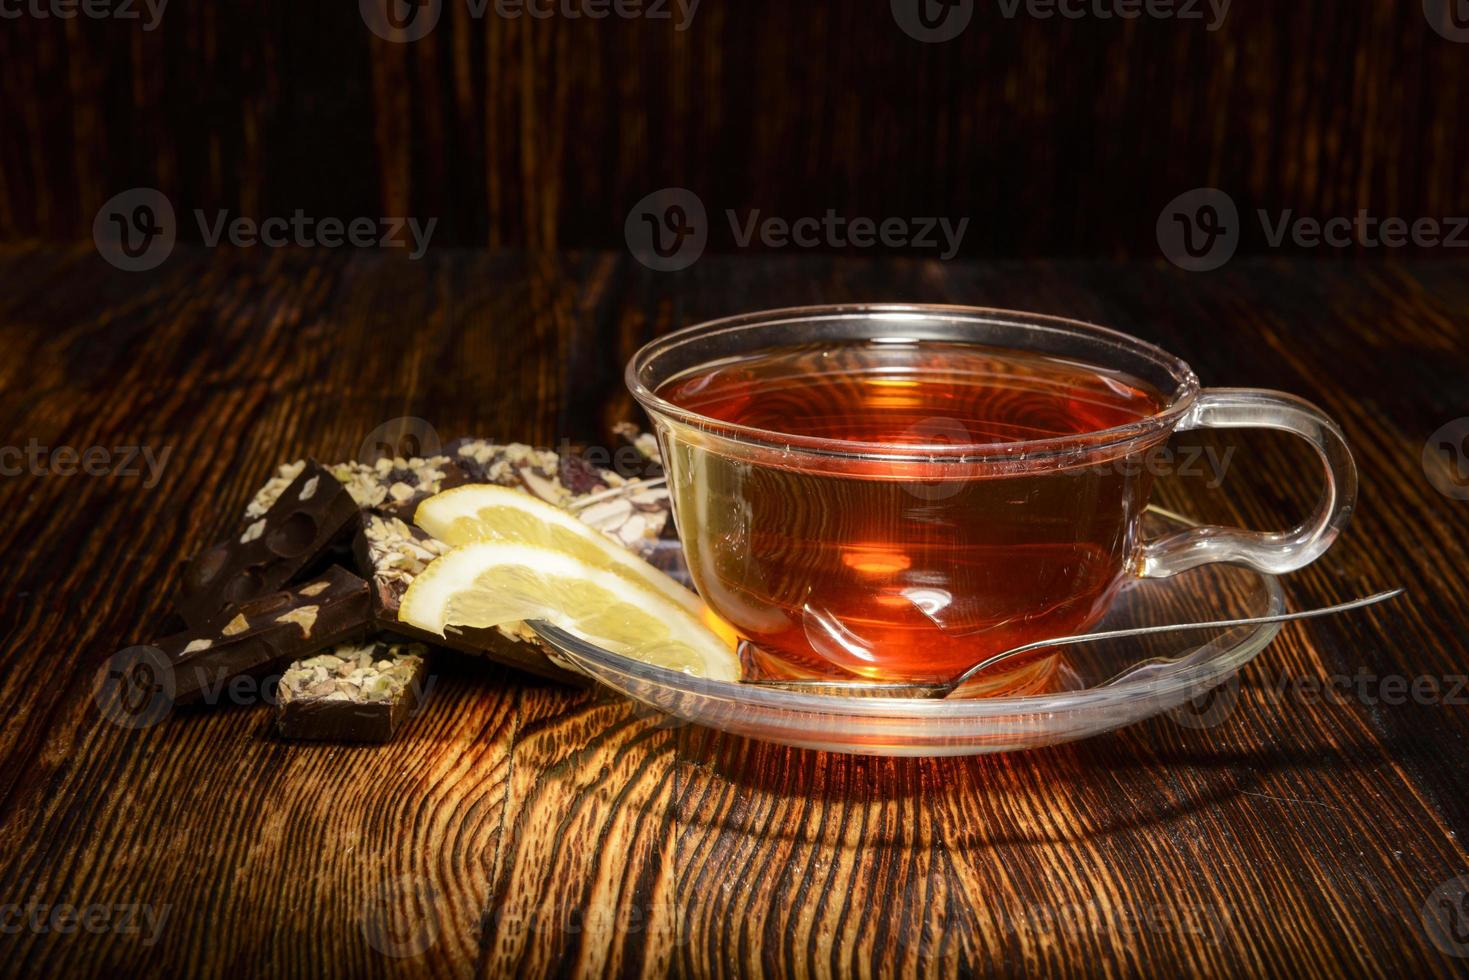 kopp te med citron på träbakgrund foto